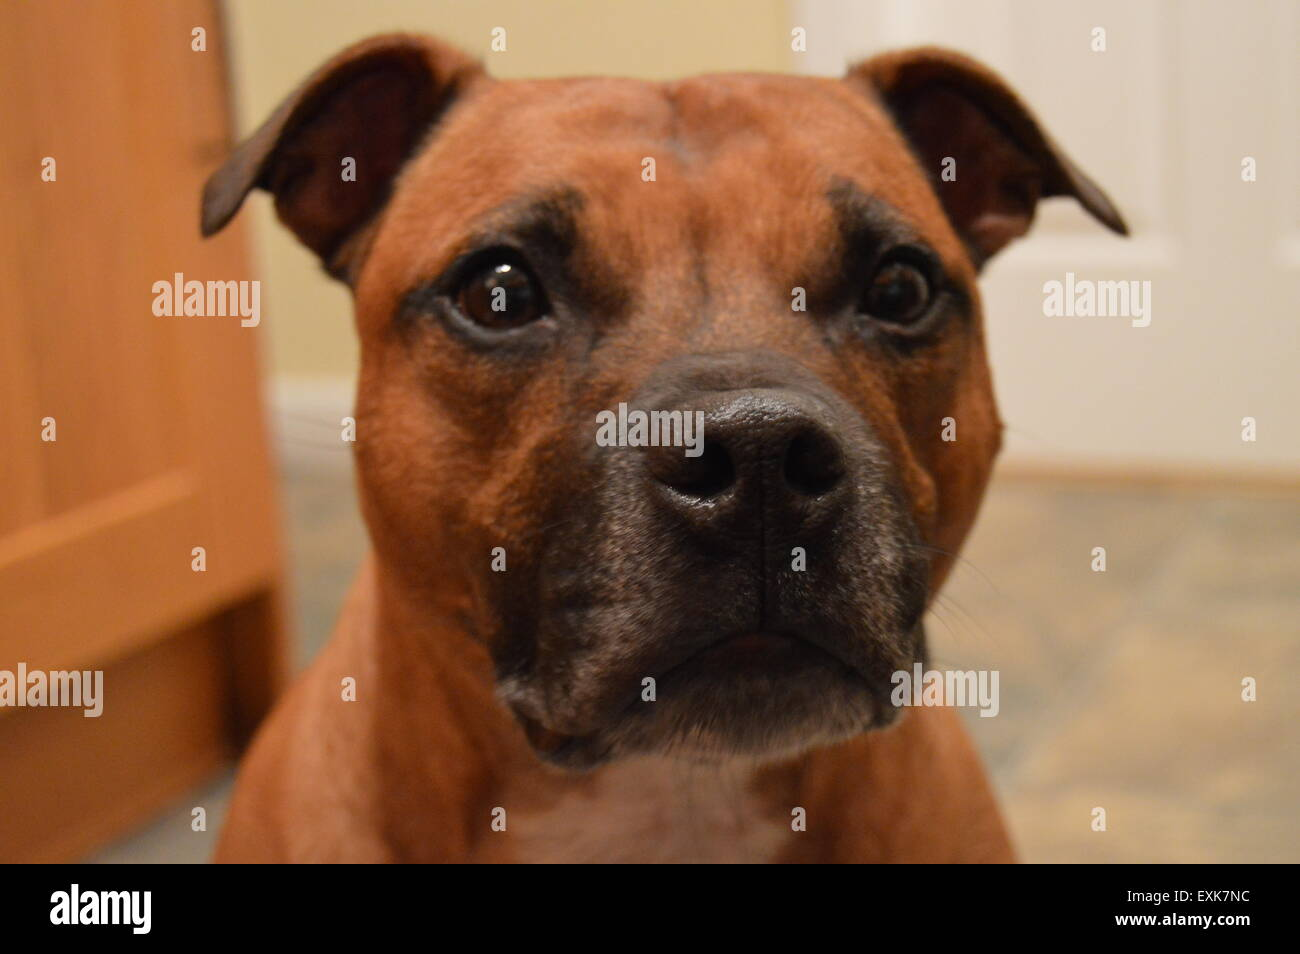 Red Staffordshire Bull Terrier Portrait - Stock Image